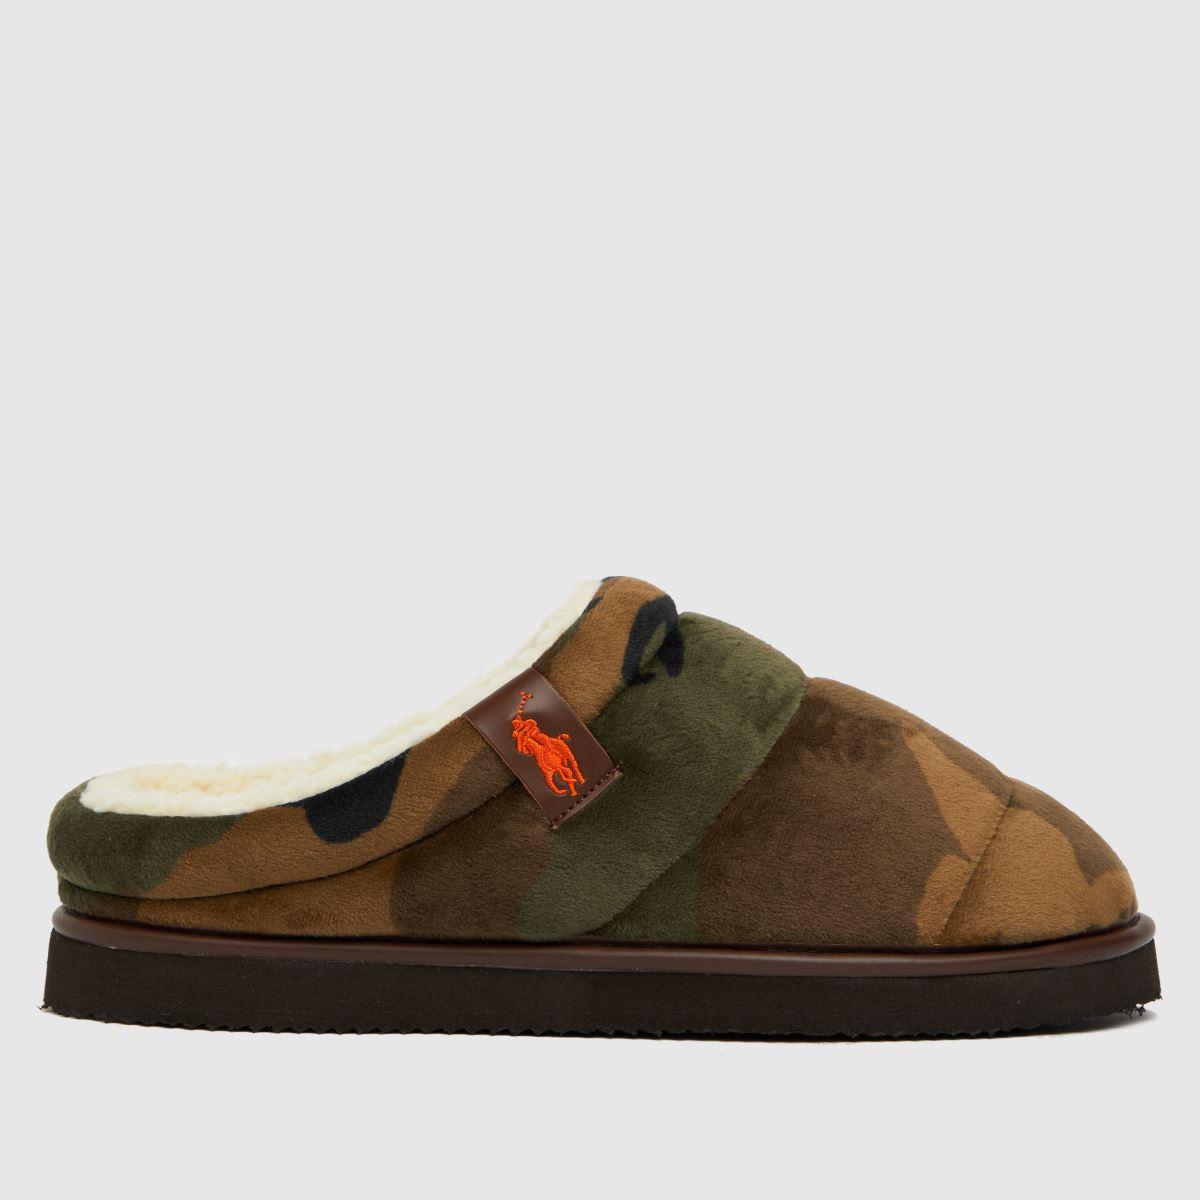 Polo Ralph Lauren Dark Green Rl Sutton Slippers